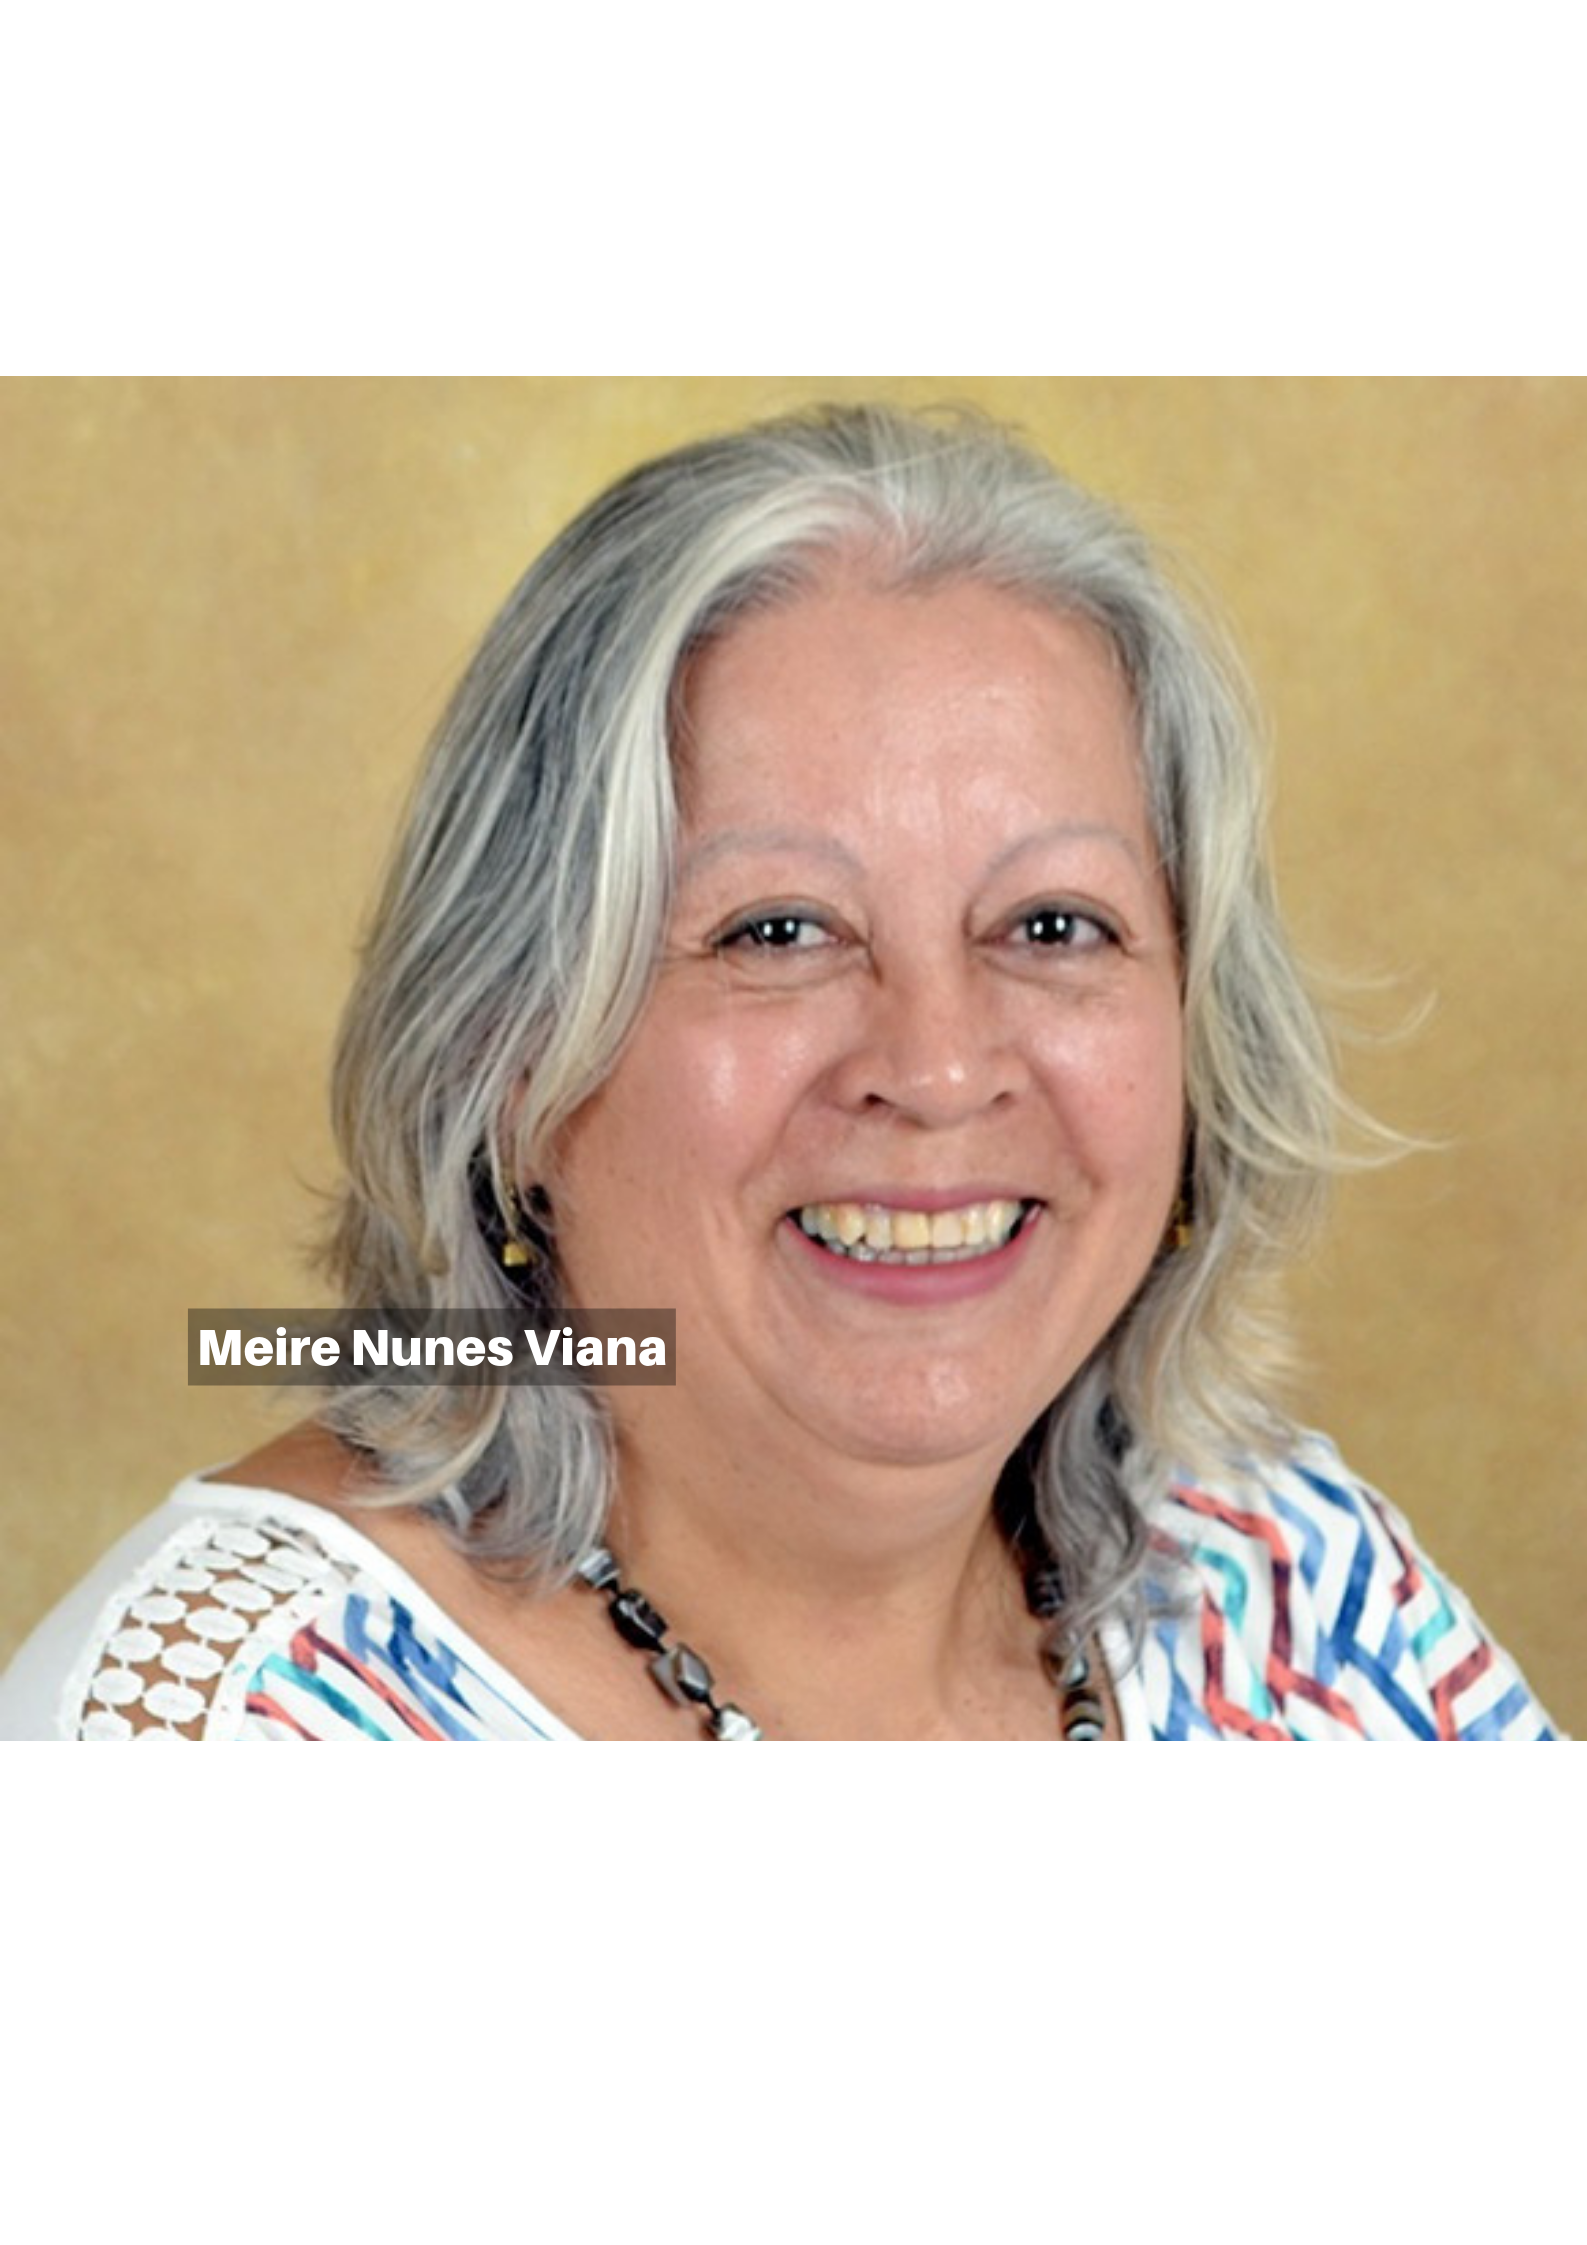 Meire Nunes Viana (4)